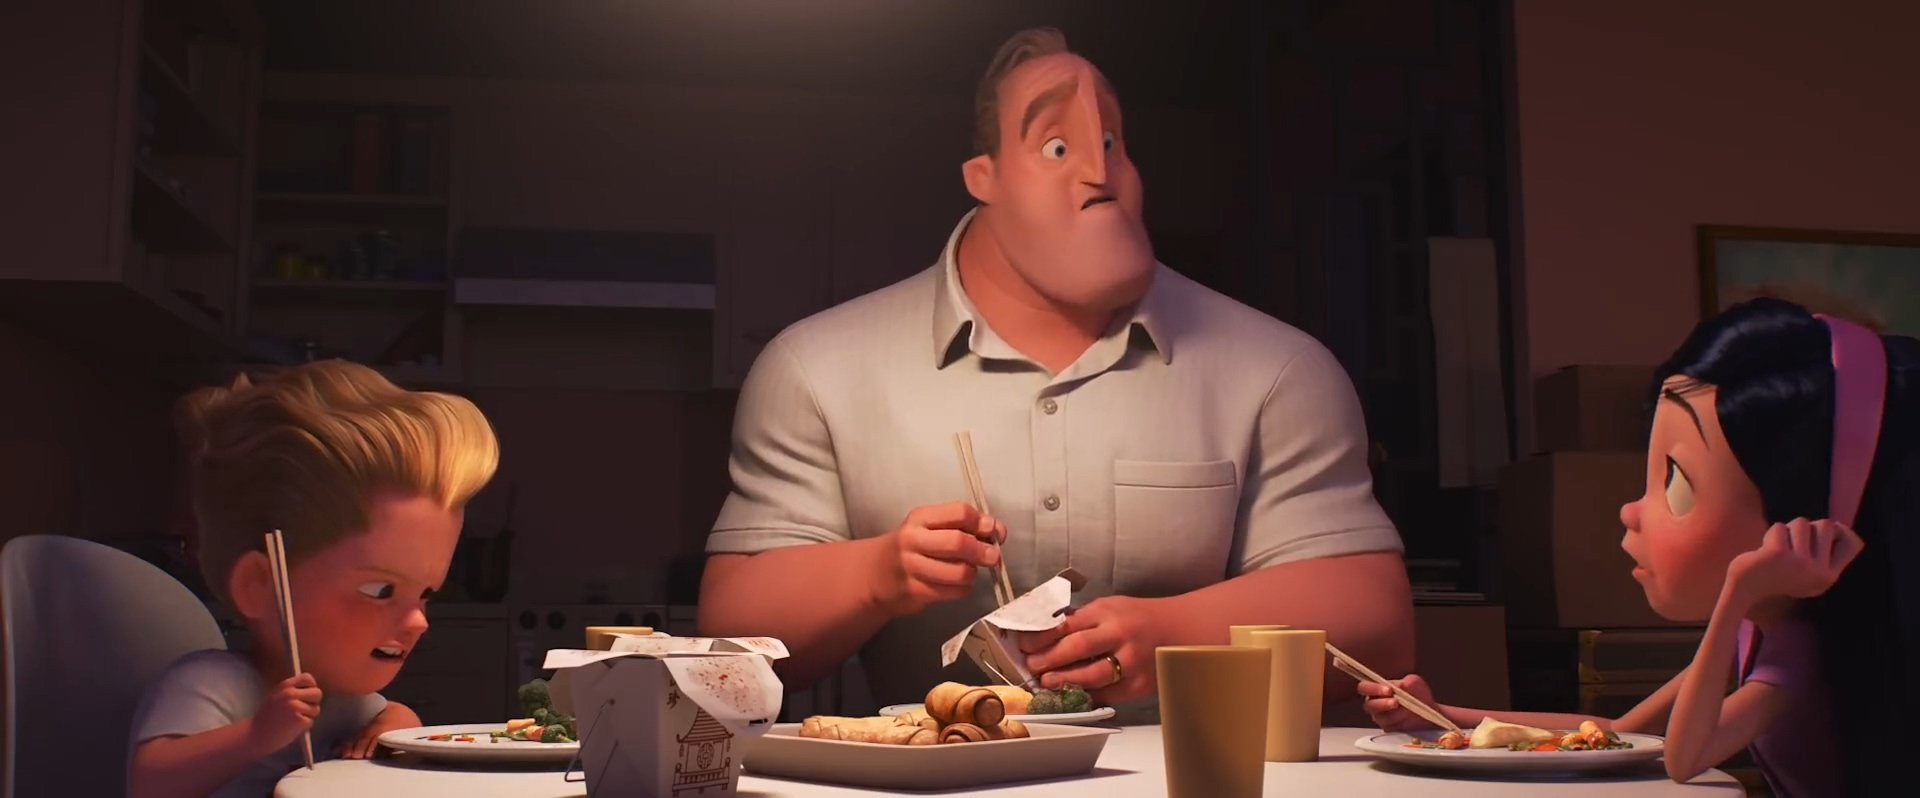 Incredibles 2 Official Trailer_023.480.jpg